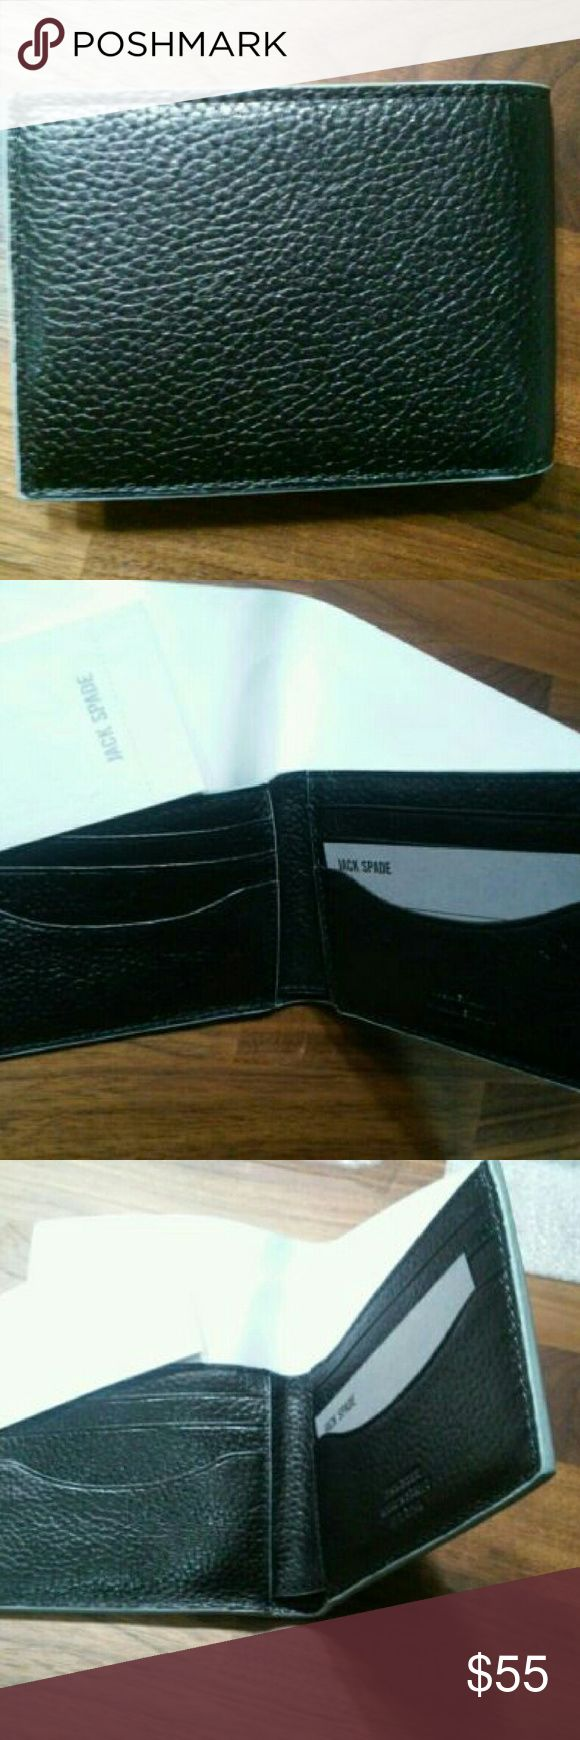 Jack Spade Mason Leather Bifold Wallet New with tags mason leather wallet. Black with grey edging around wallet. Jack Spade Bags Wallets